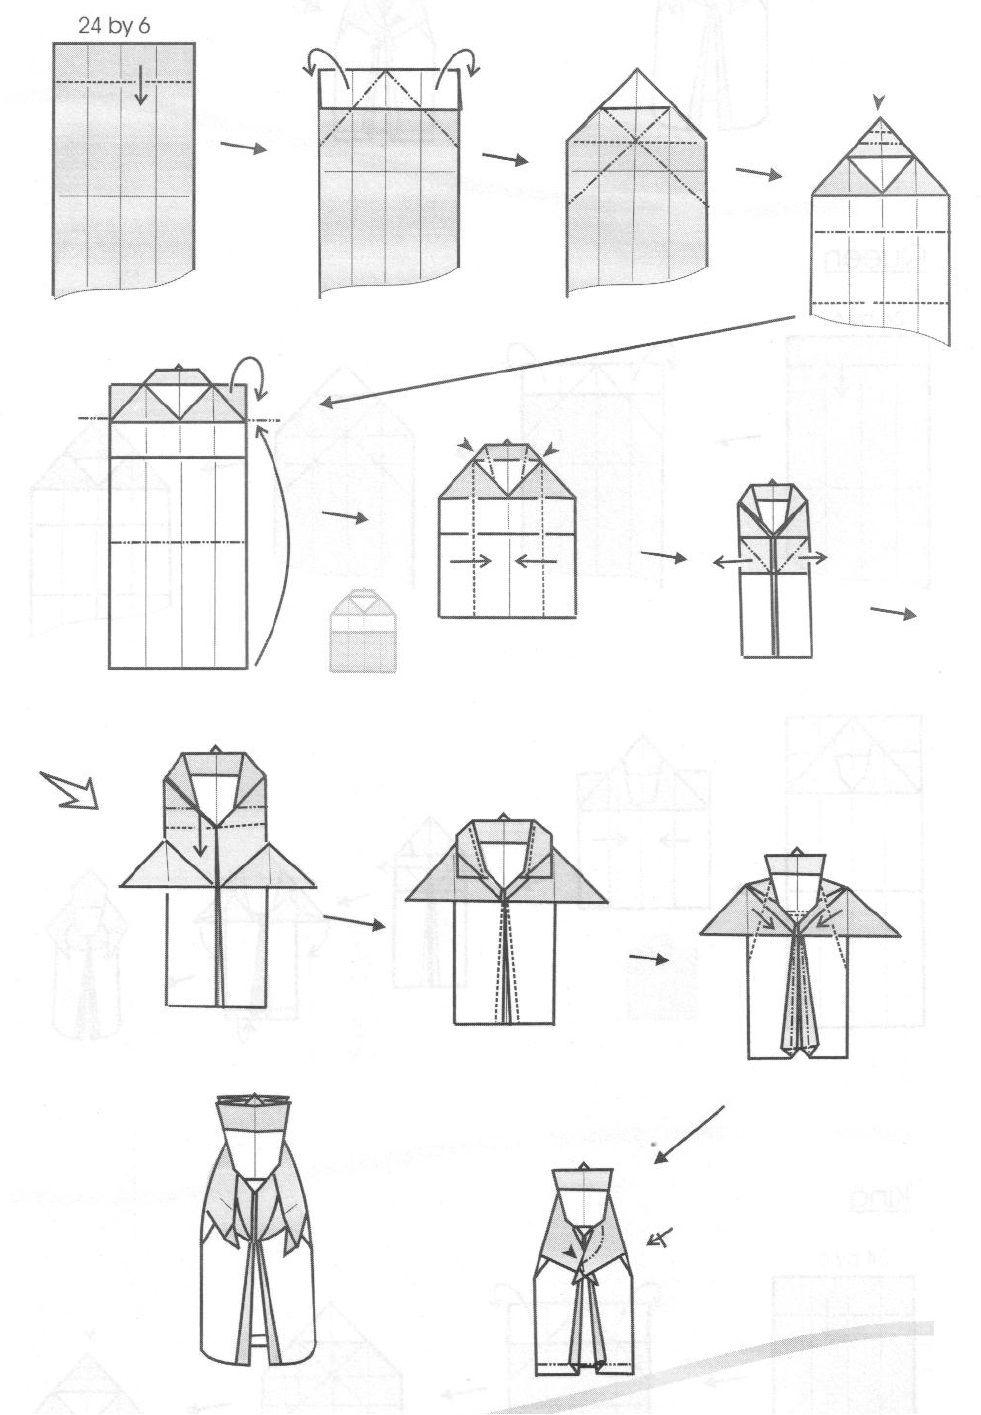 Rey+01+-+Max+Hulme+-+Origami+USA+Collection+2008.jpg (981